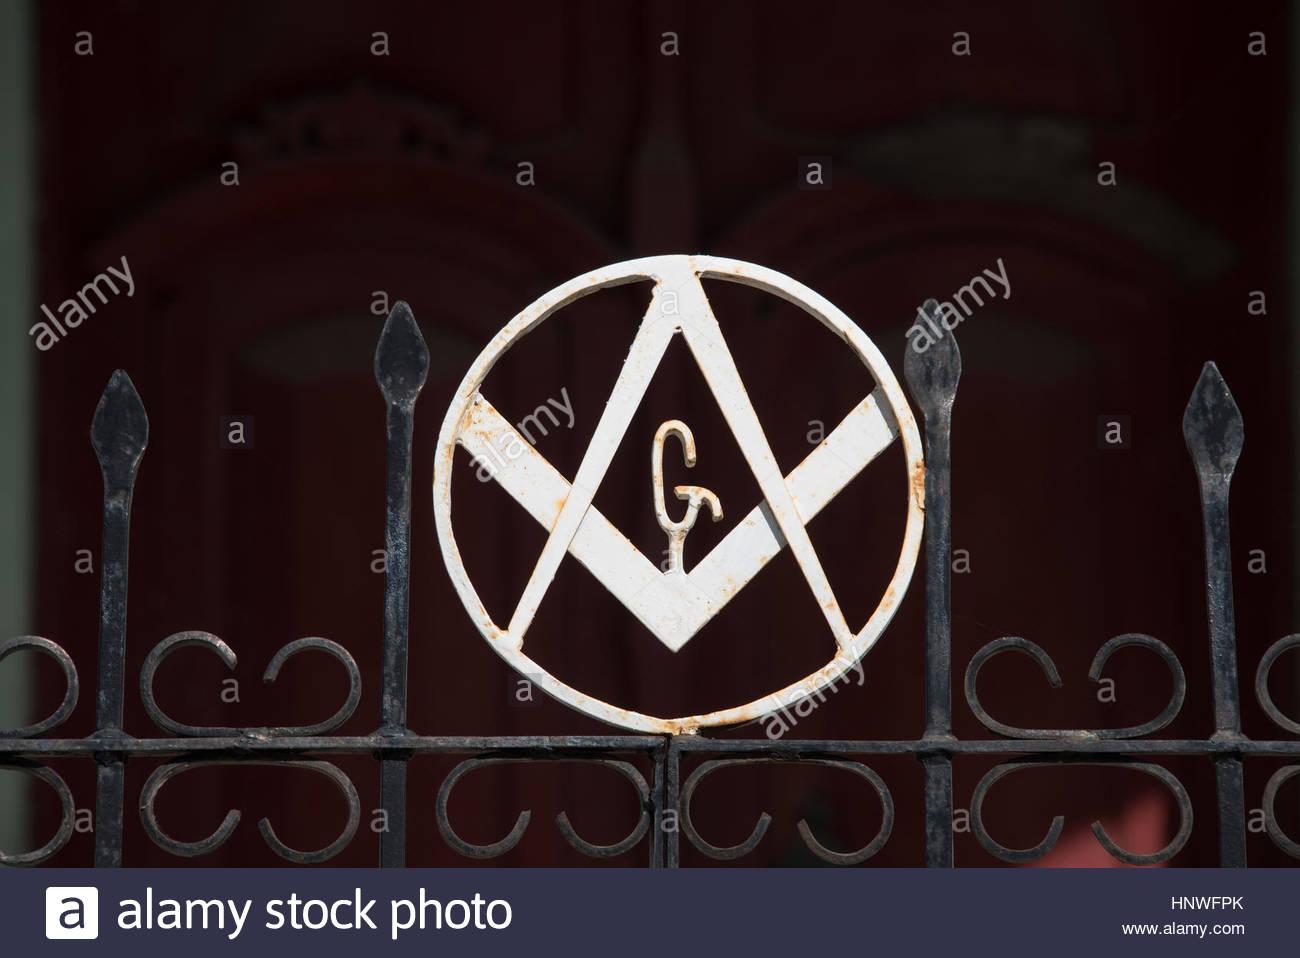 Freemason Symbol Stock Photos Freemason Symbol Stock Images Alamy